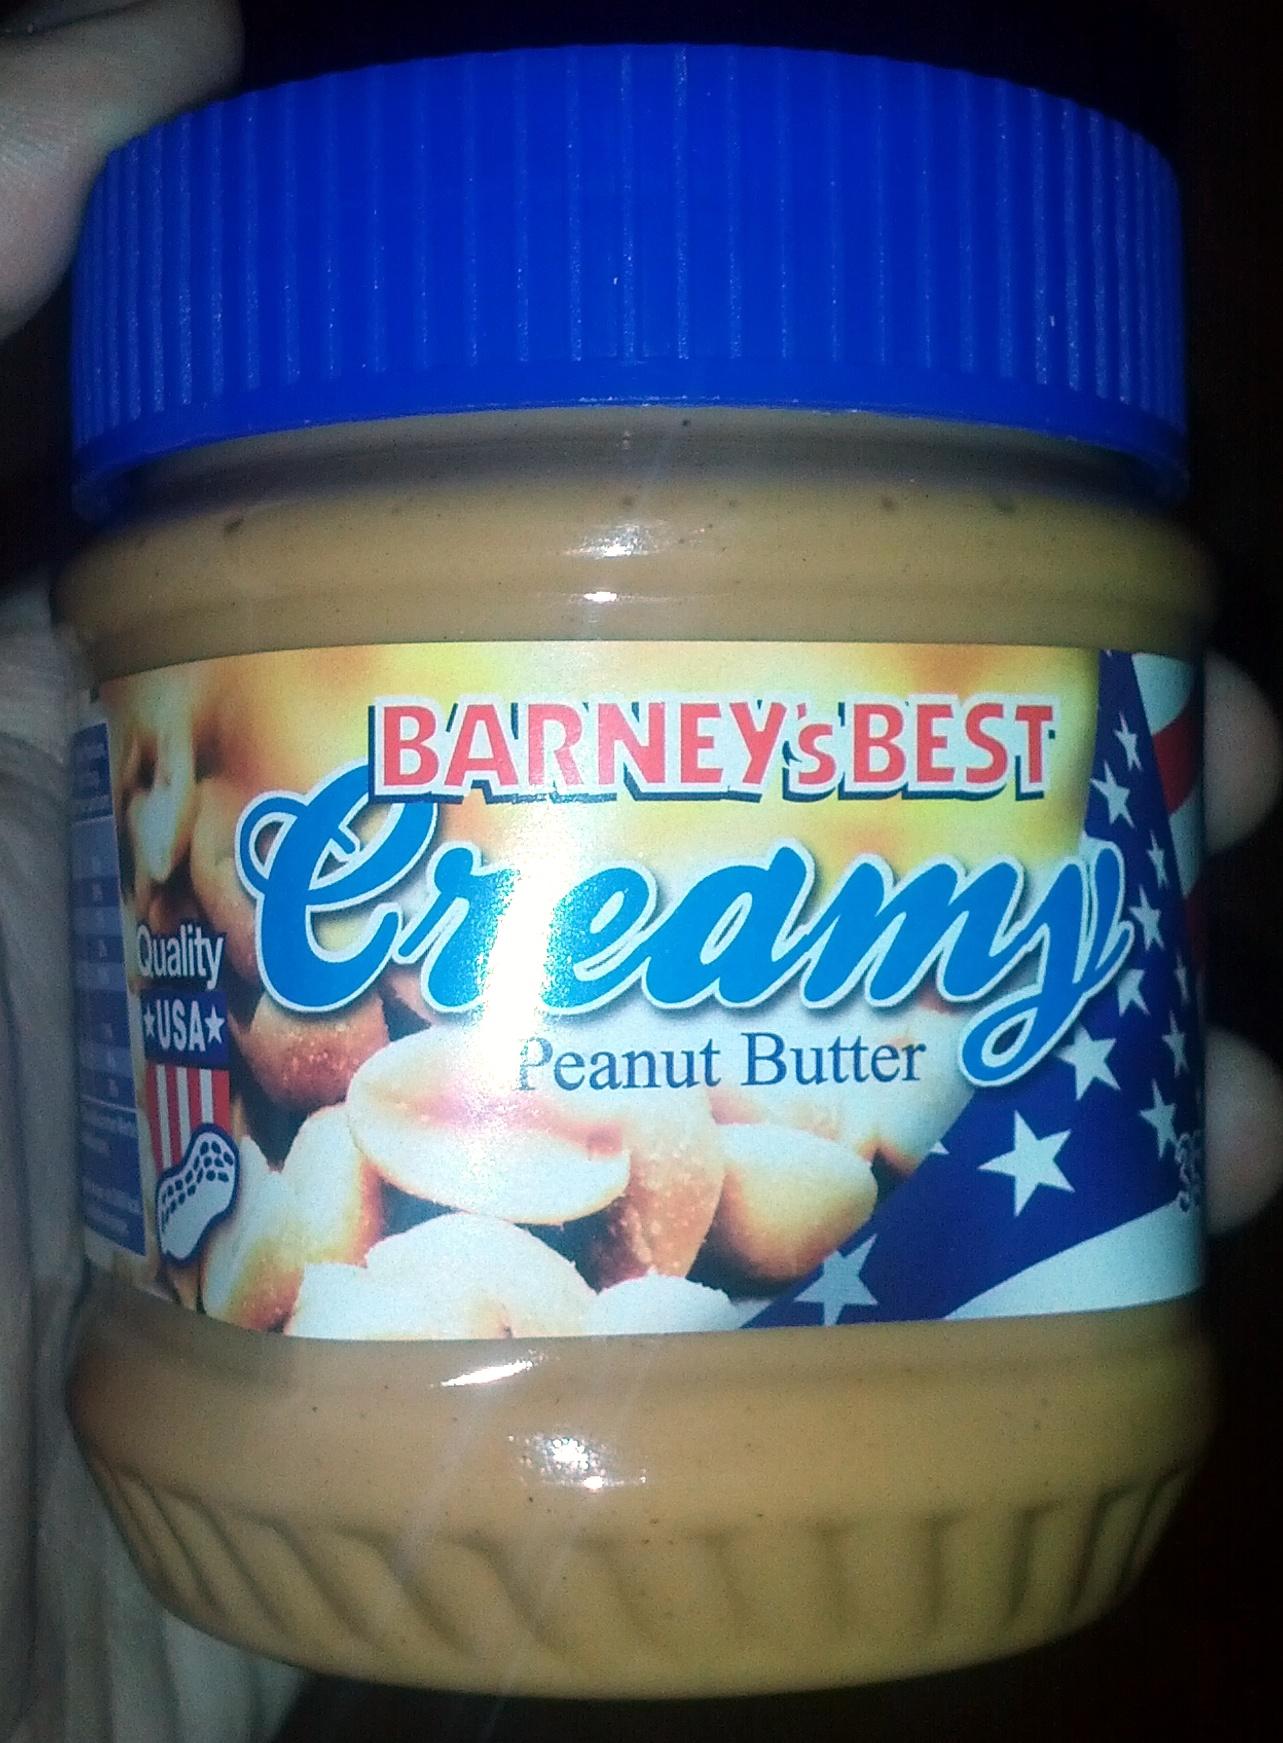 Barney's Best Creamy Peanut Butter - Produit